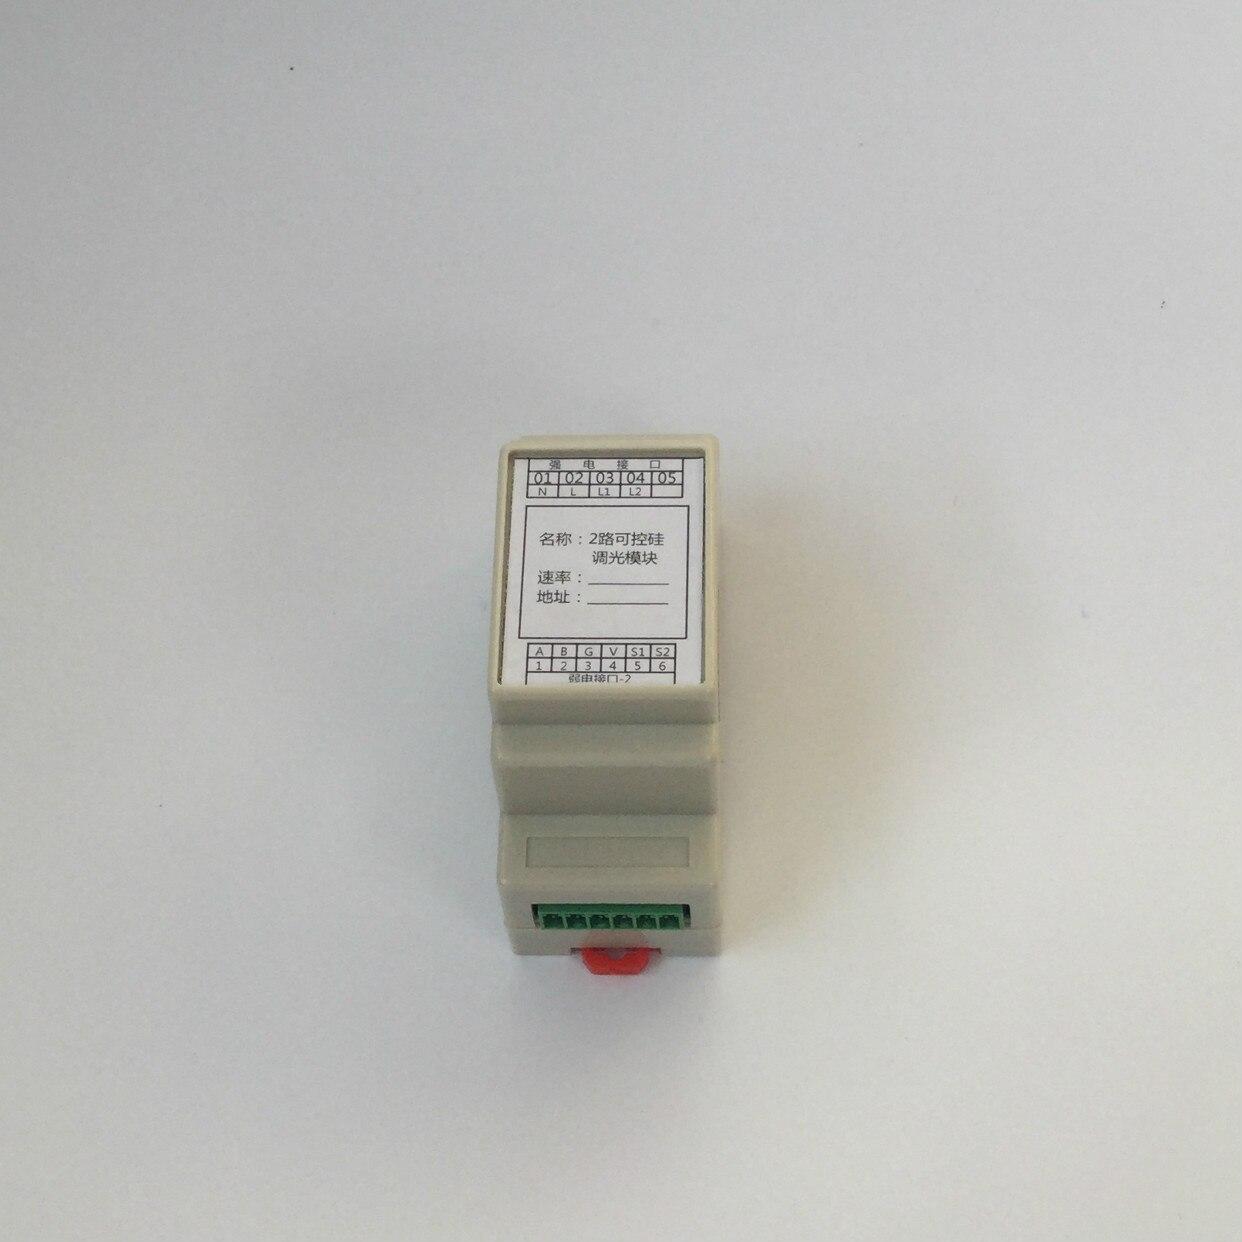 2 Way Thyristor Dimming Module RS485, Modbus, HD0742<br>